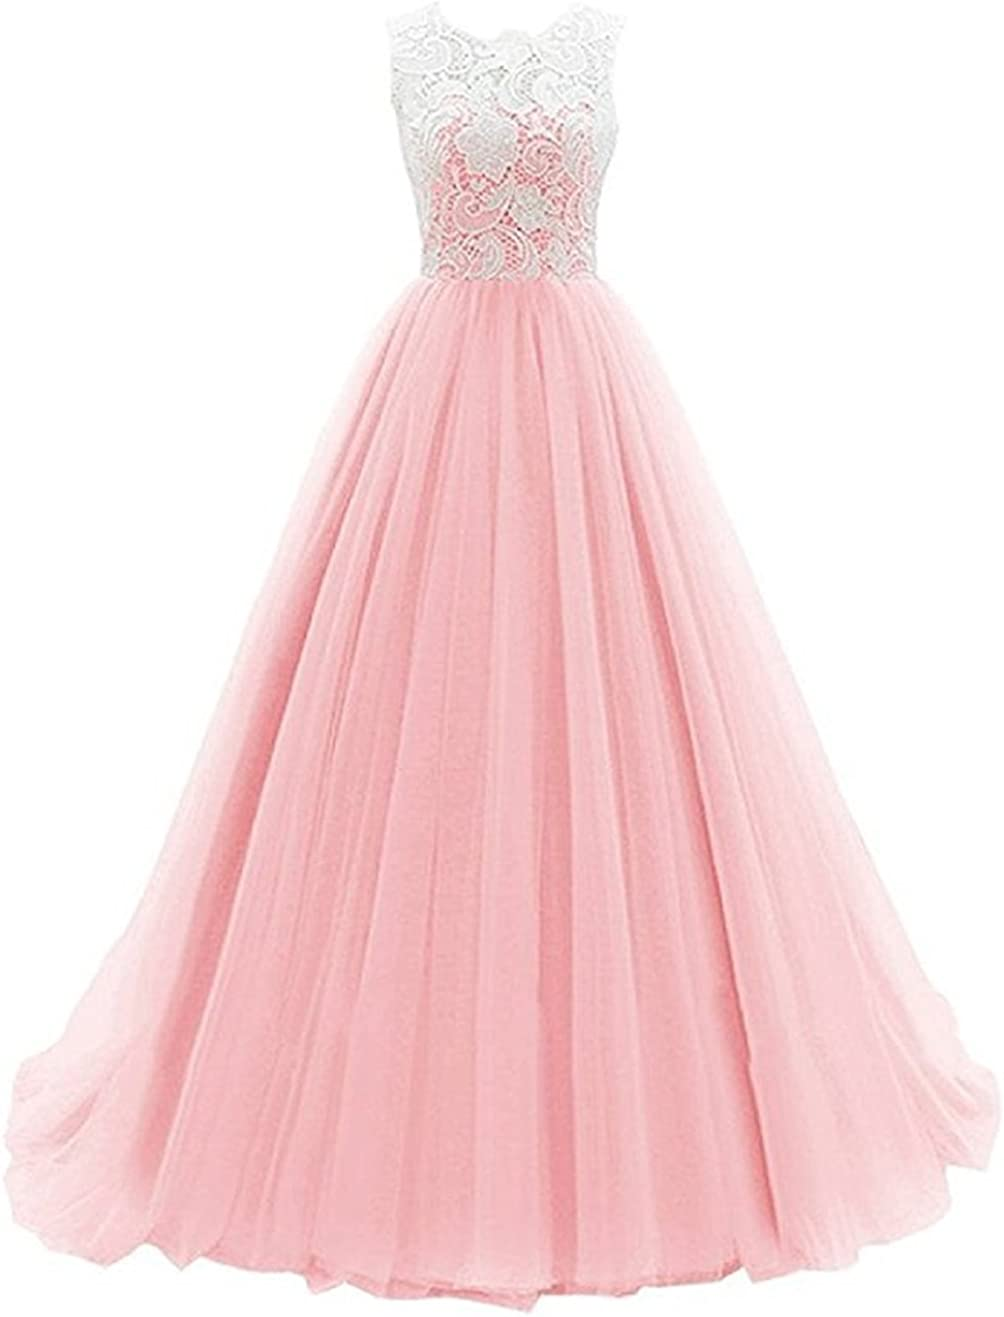 Mocoshop Little Big Girls' Tulle Lace Flower Graduation Wedding Dress Prom Gowns